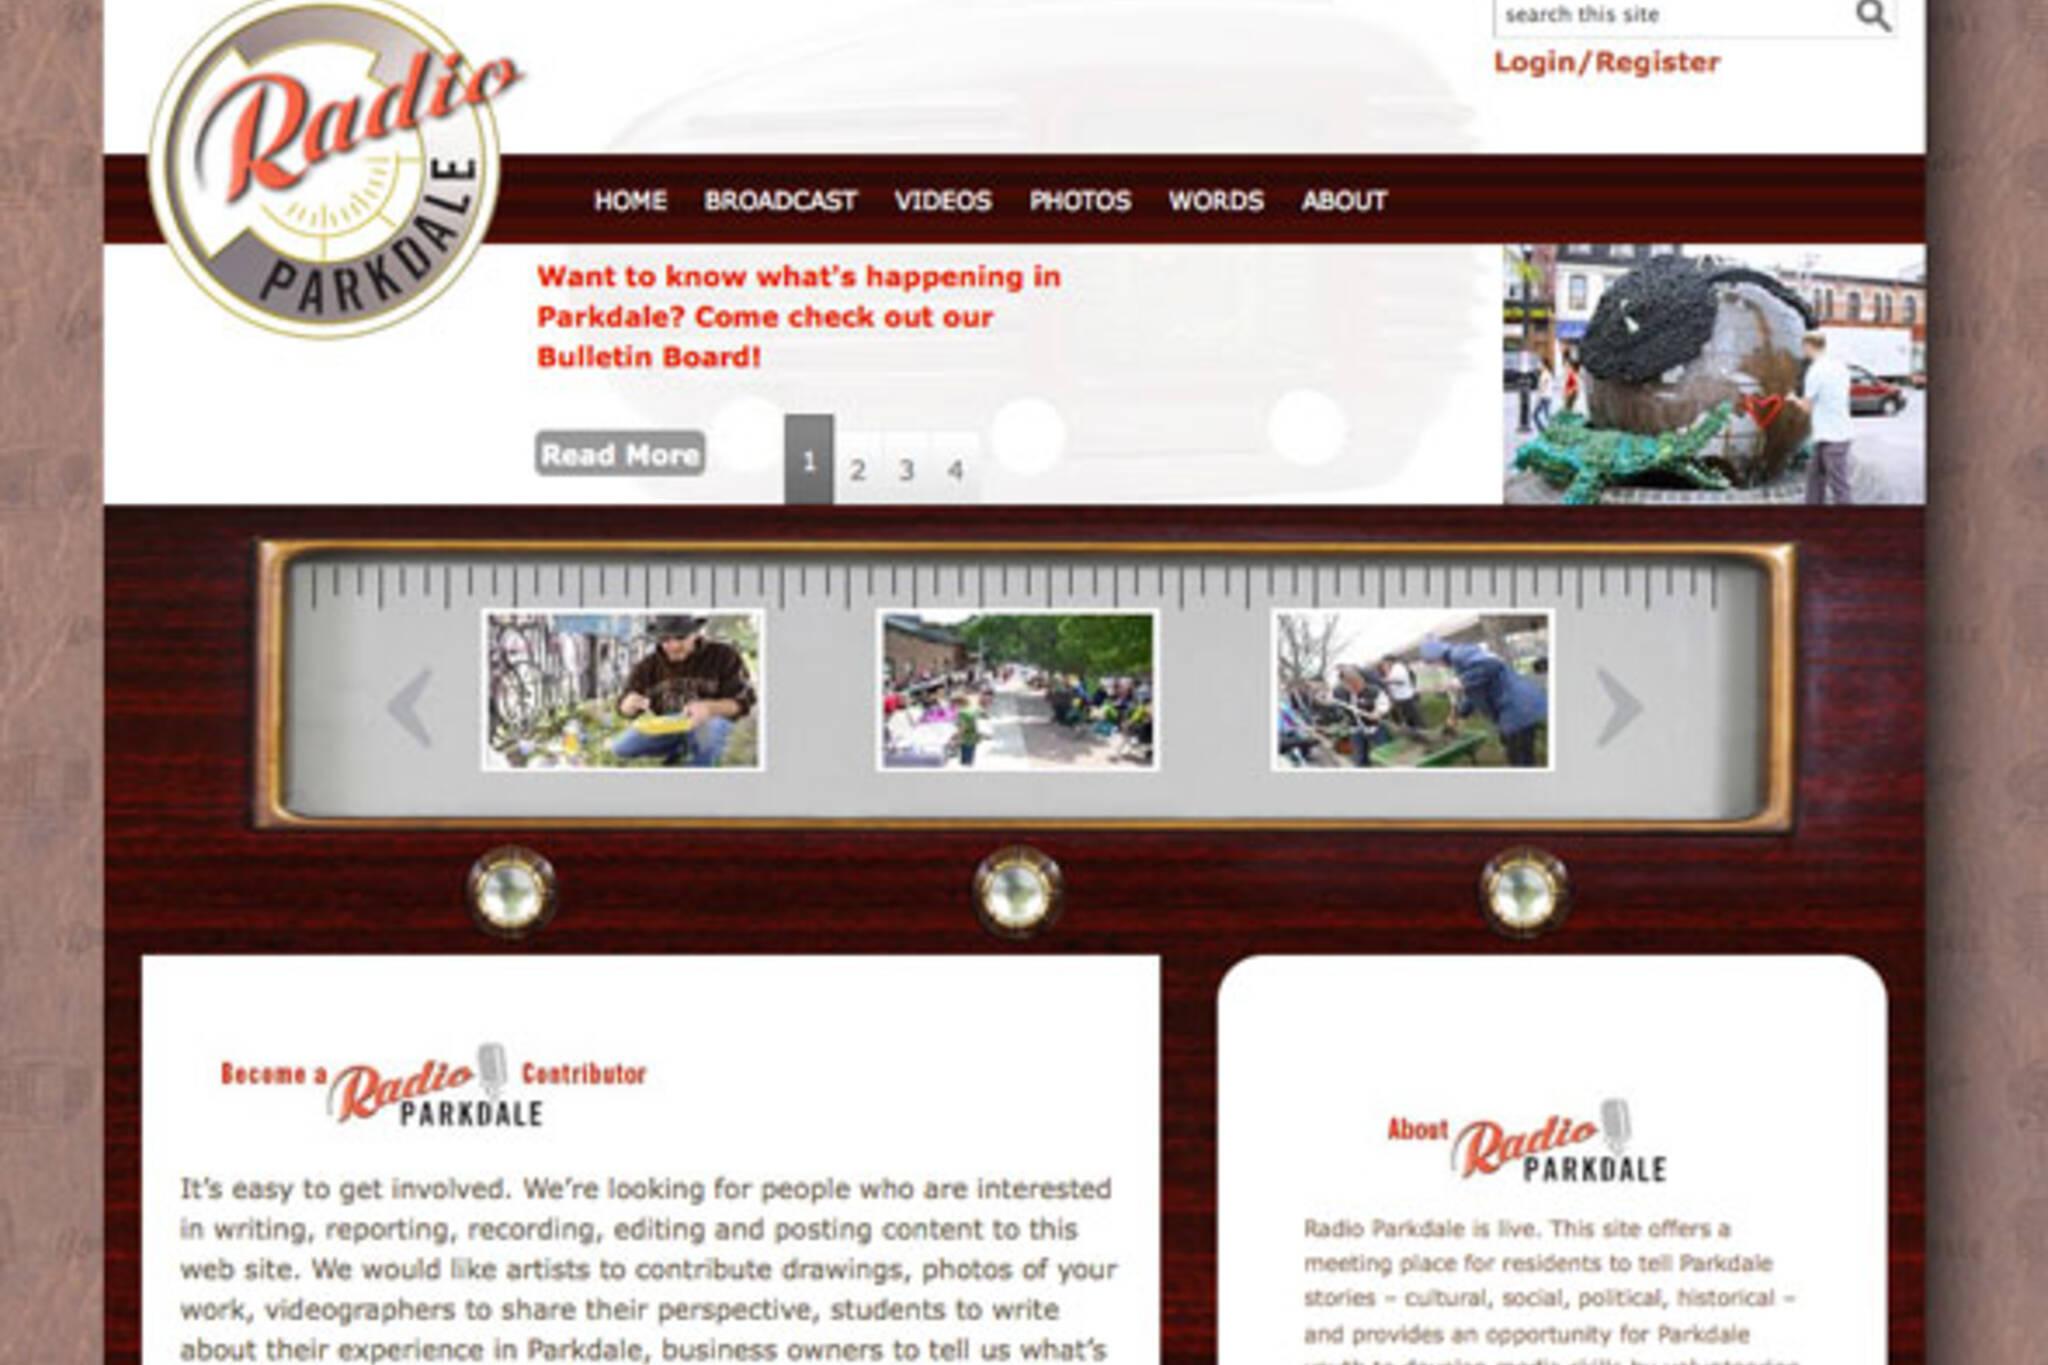 Parkdale Radio